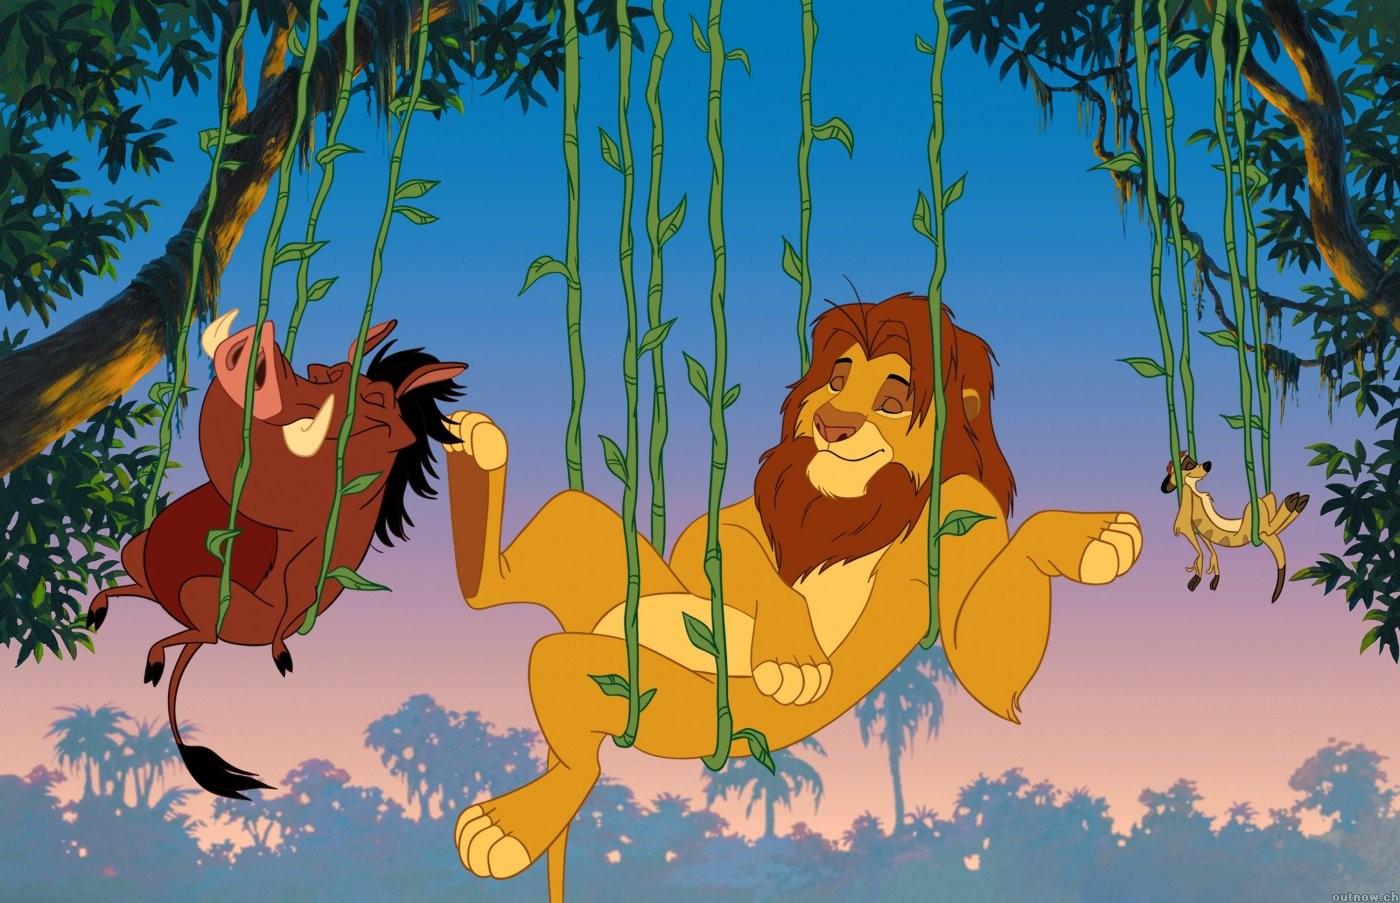 Fond D écran Le Roi Lion Disney Timon Pumba Simba